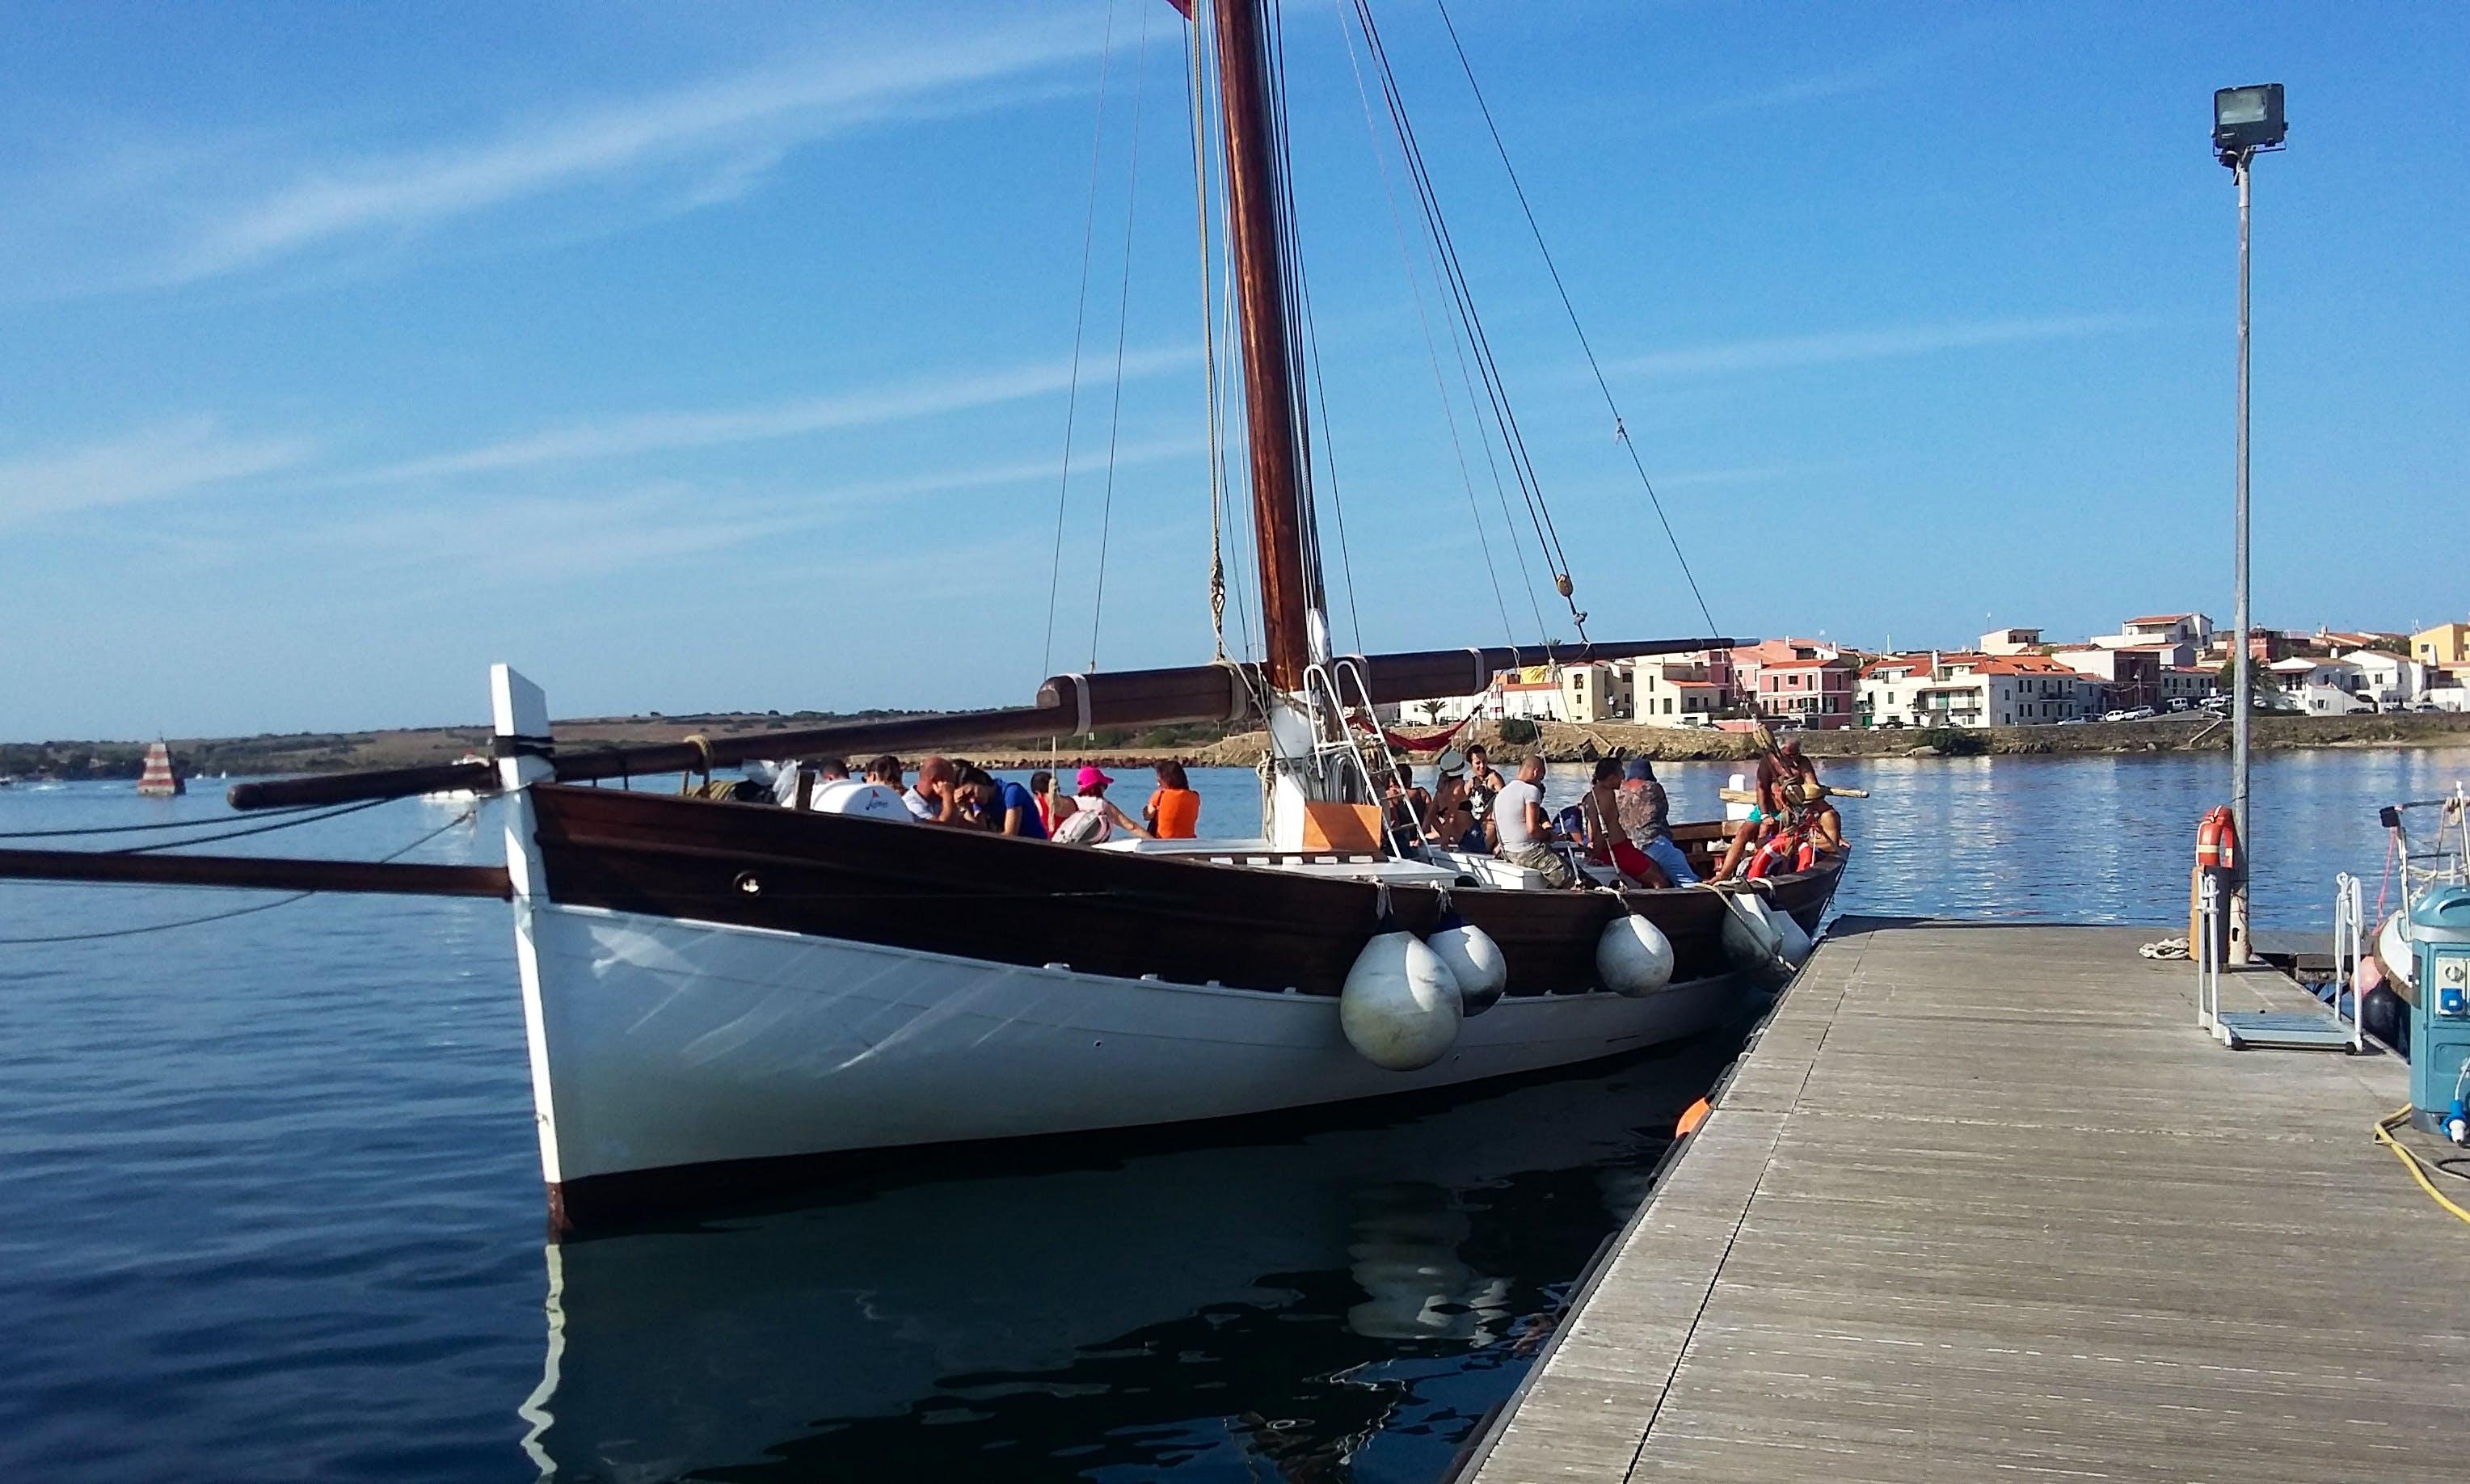 Enjoy Sightseeing Tours in Stintino, Sardegna on Elizabeth Gulet